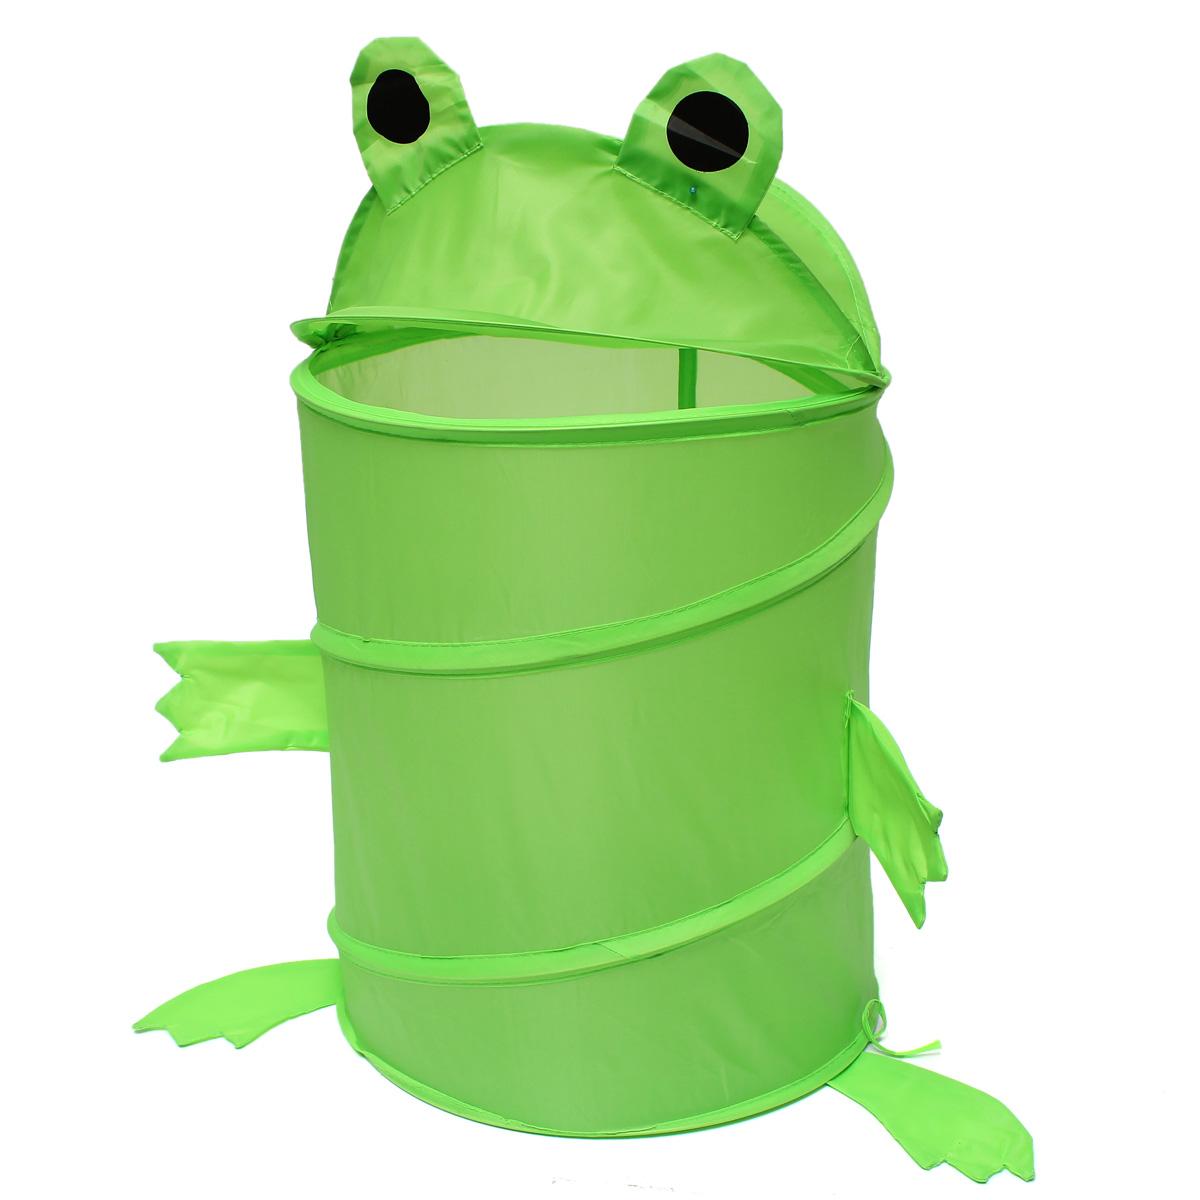 Kids Baby Foldable Laundry Hamper Pop Up Animal Laundry Basket Bag Toys Storage Dirty Washing Clothes & Toy Storage Organizer